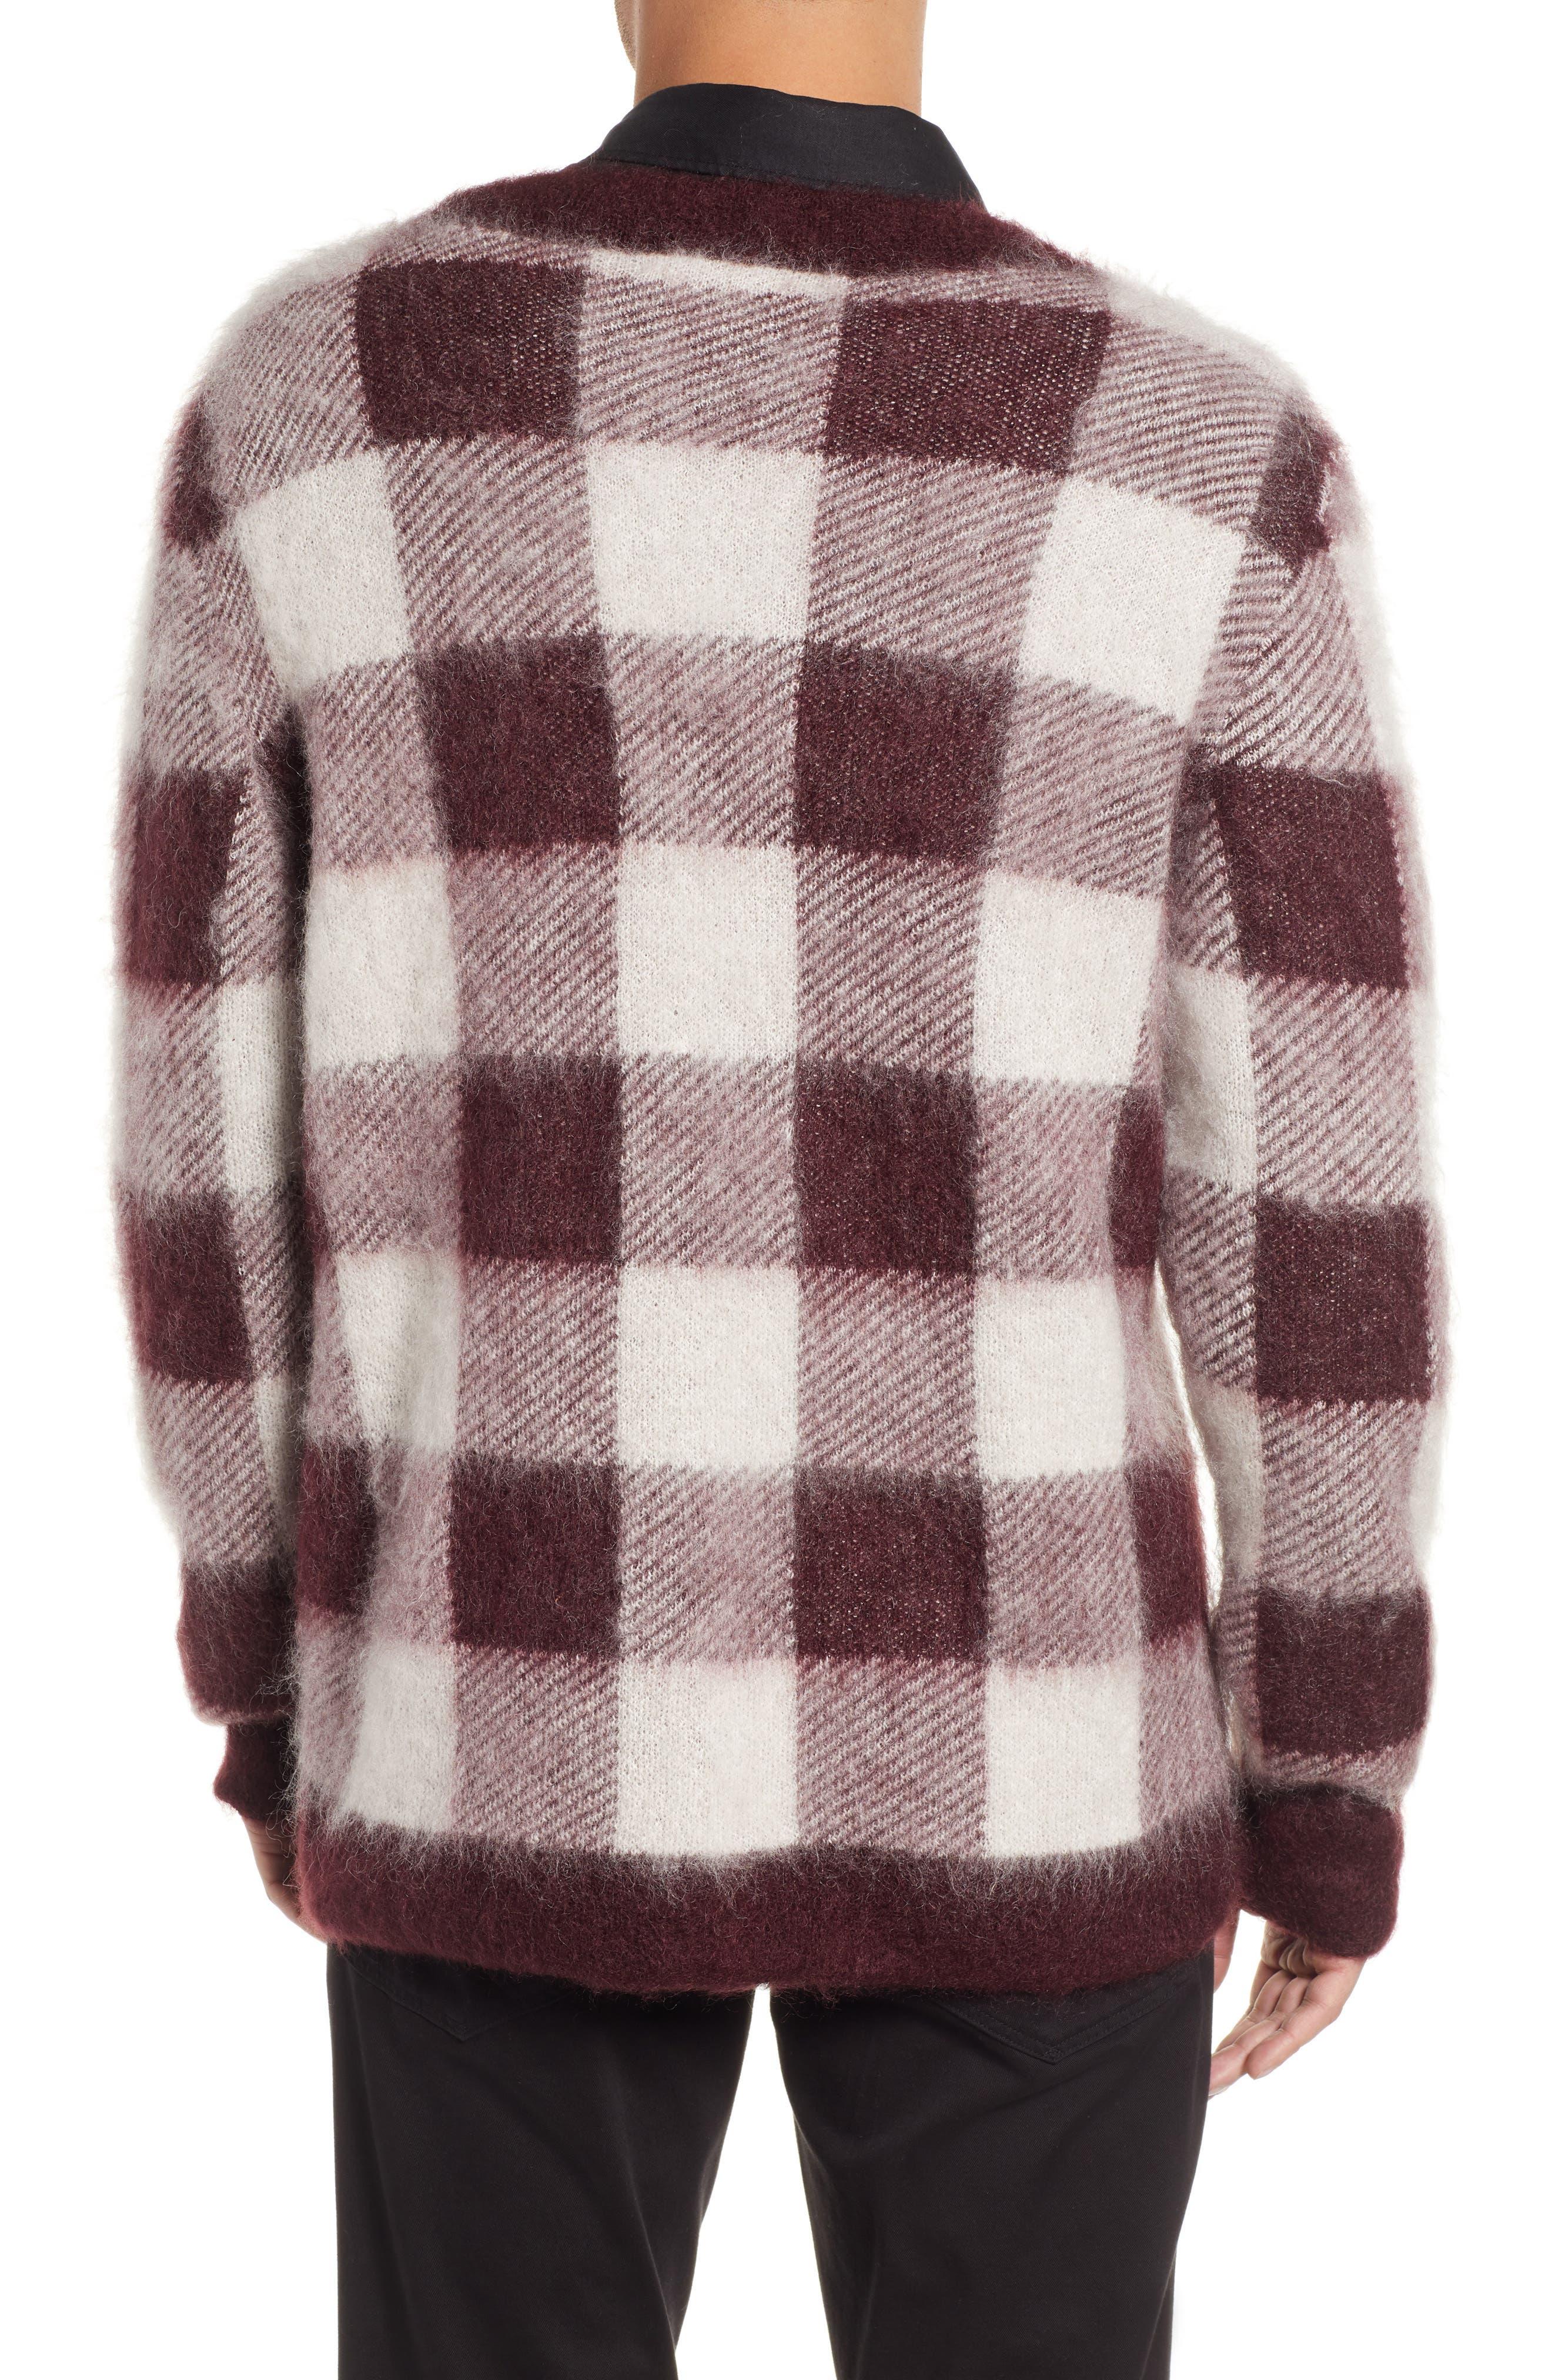 Low Mohair Blend V-Neck Sweater,                             Alternate thumbnail 2, color,                             PLUM CHECK